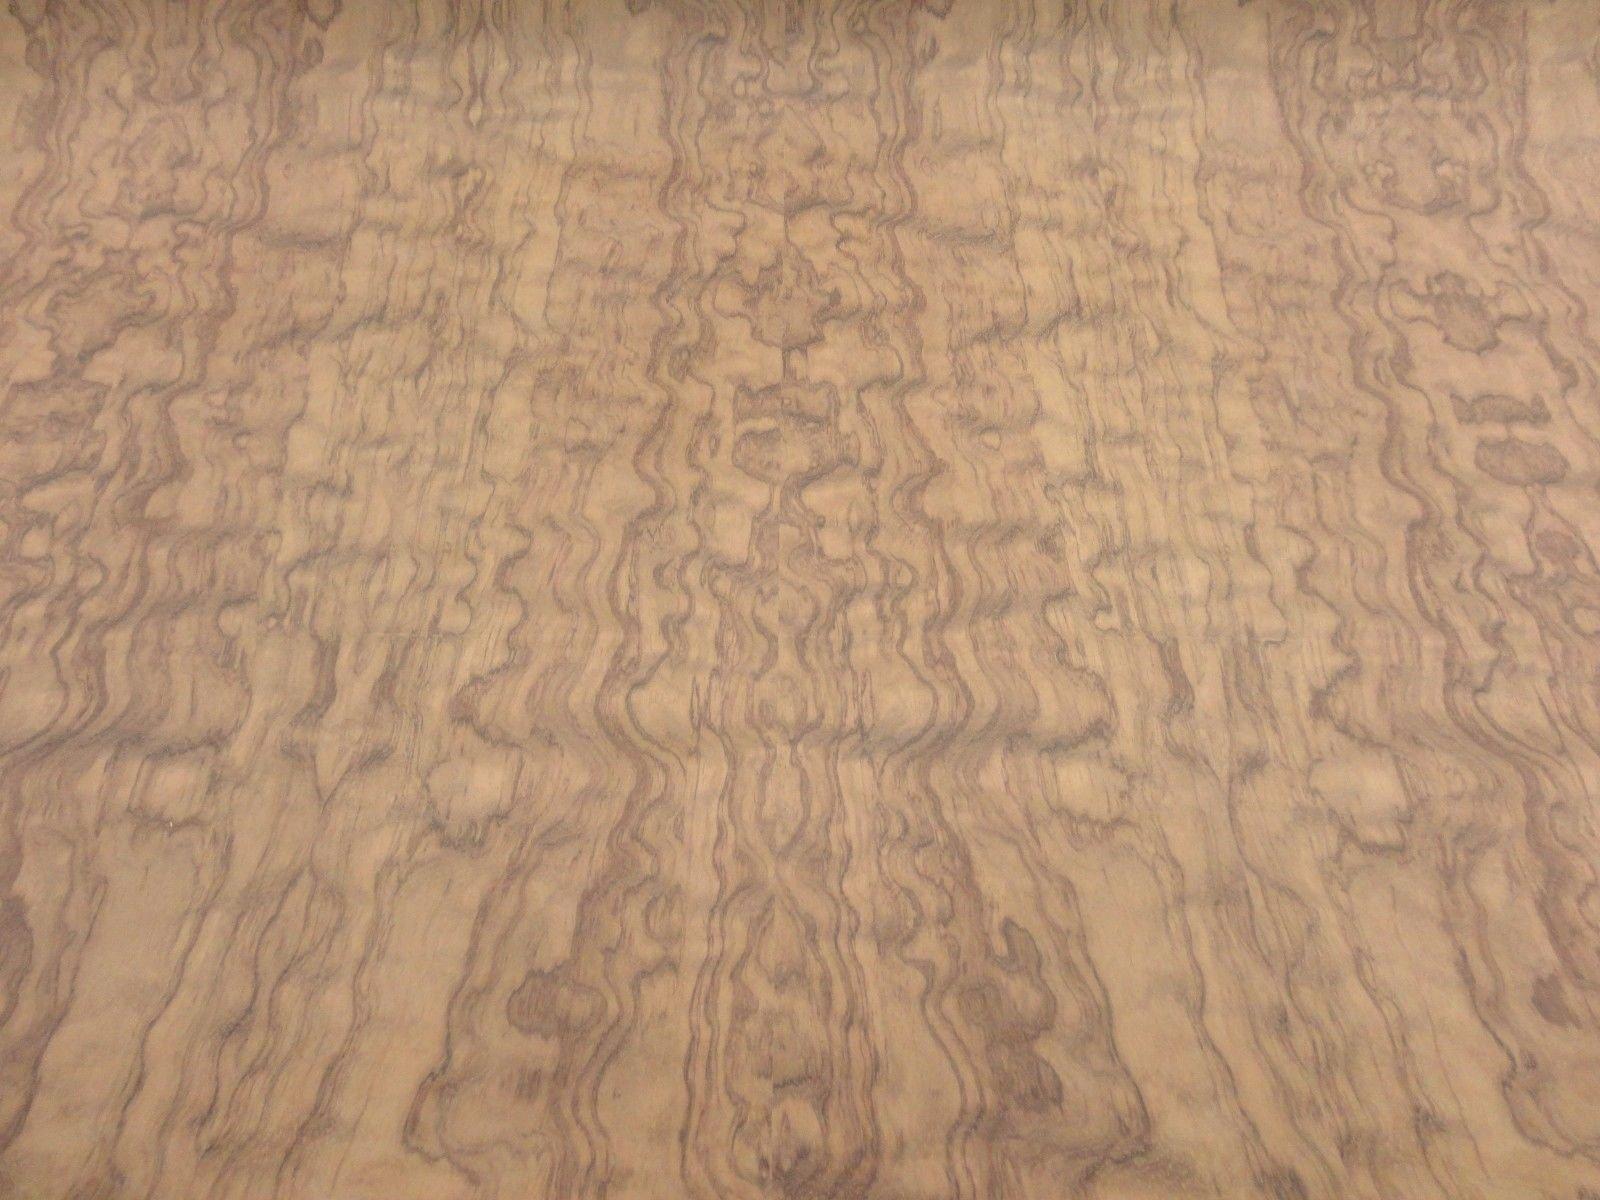 Bubinga Waterfall Figured Quilted wood veneer 48'' x 48'' with wood backer 1/25''